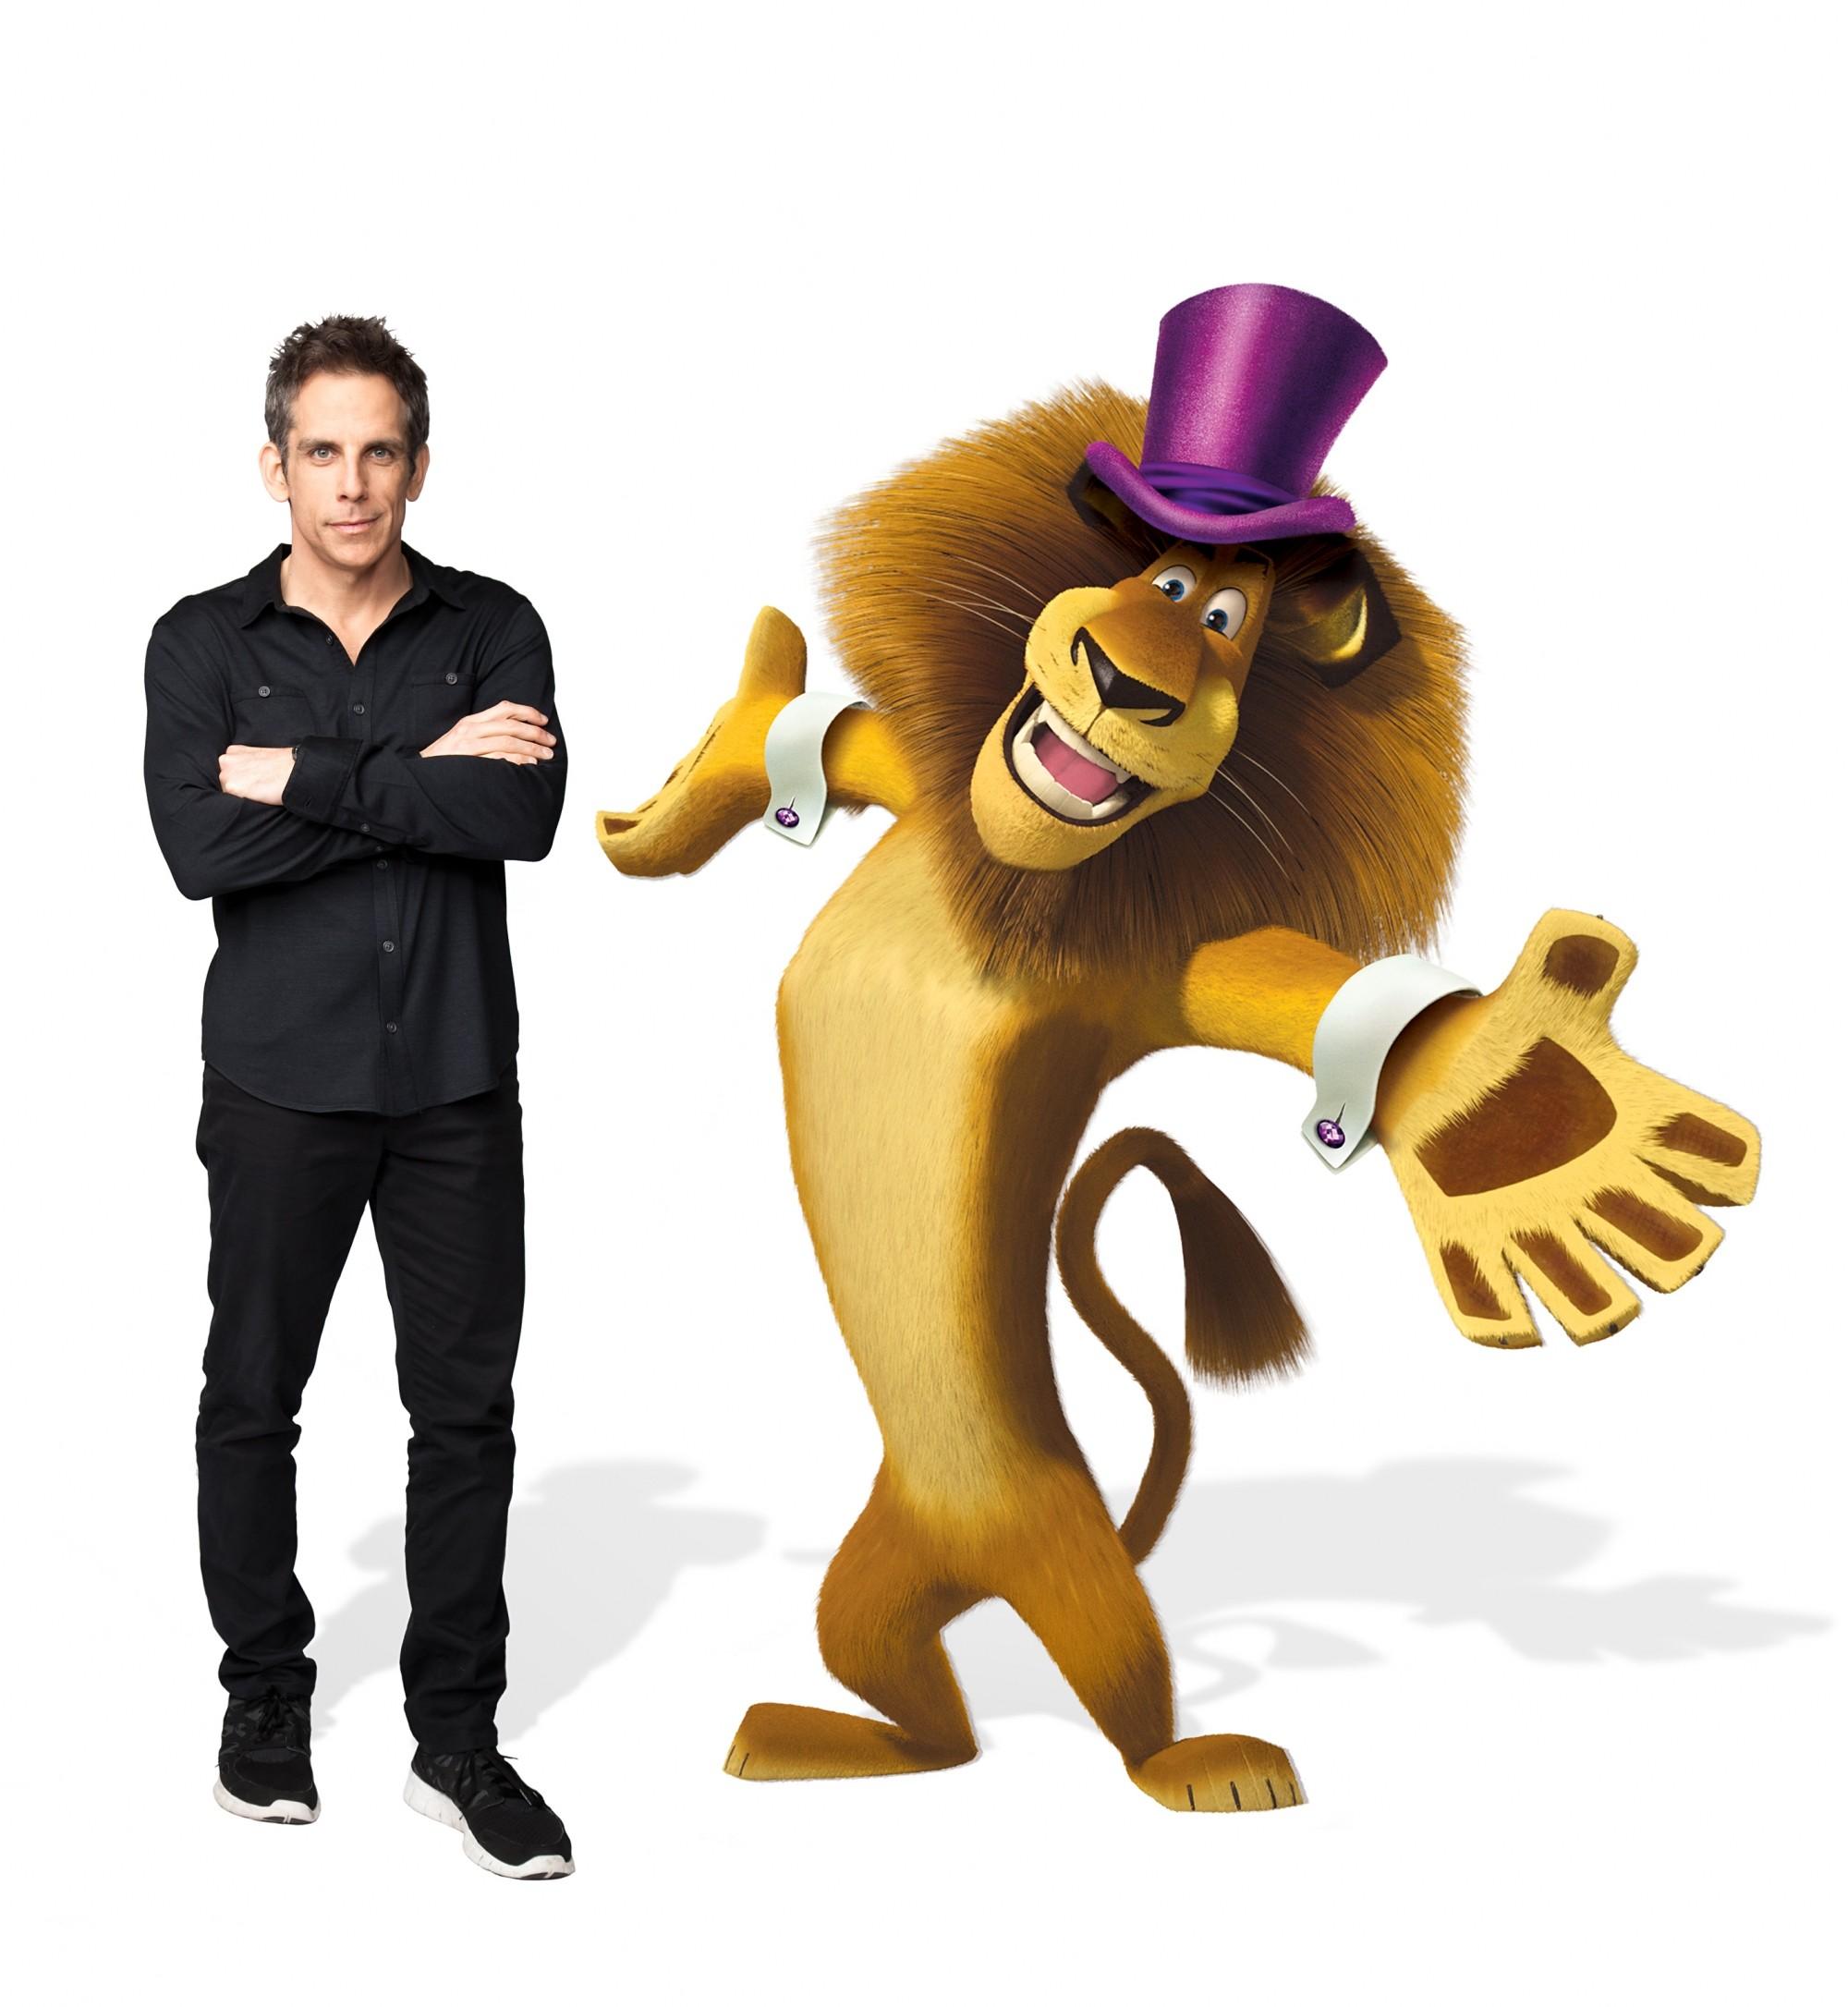 промо-слайды Мадагаскар 3 в 3D Бен Стиллер,